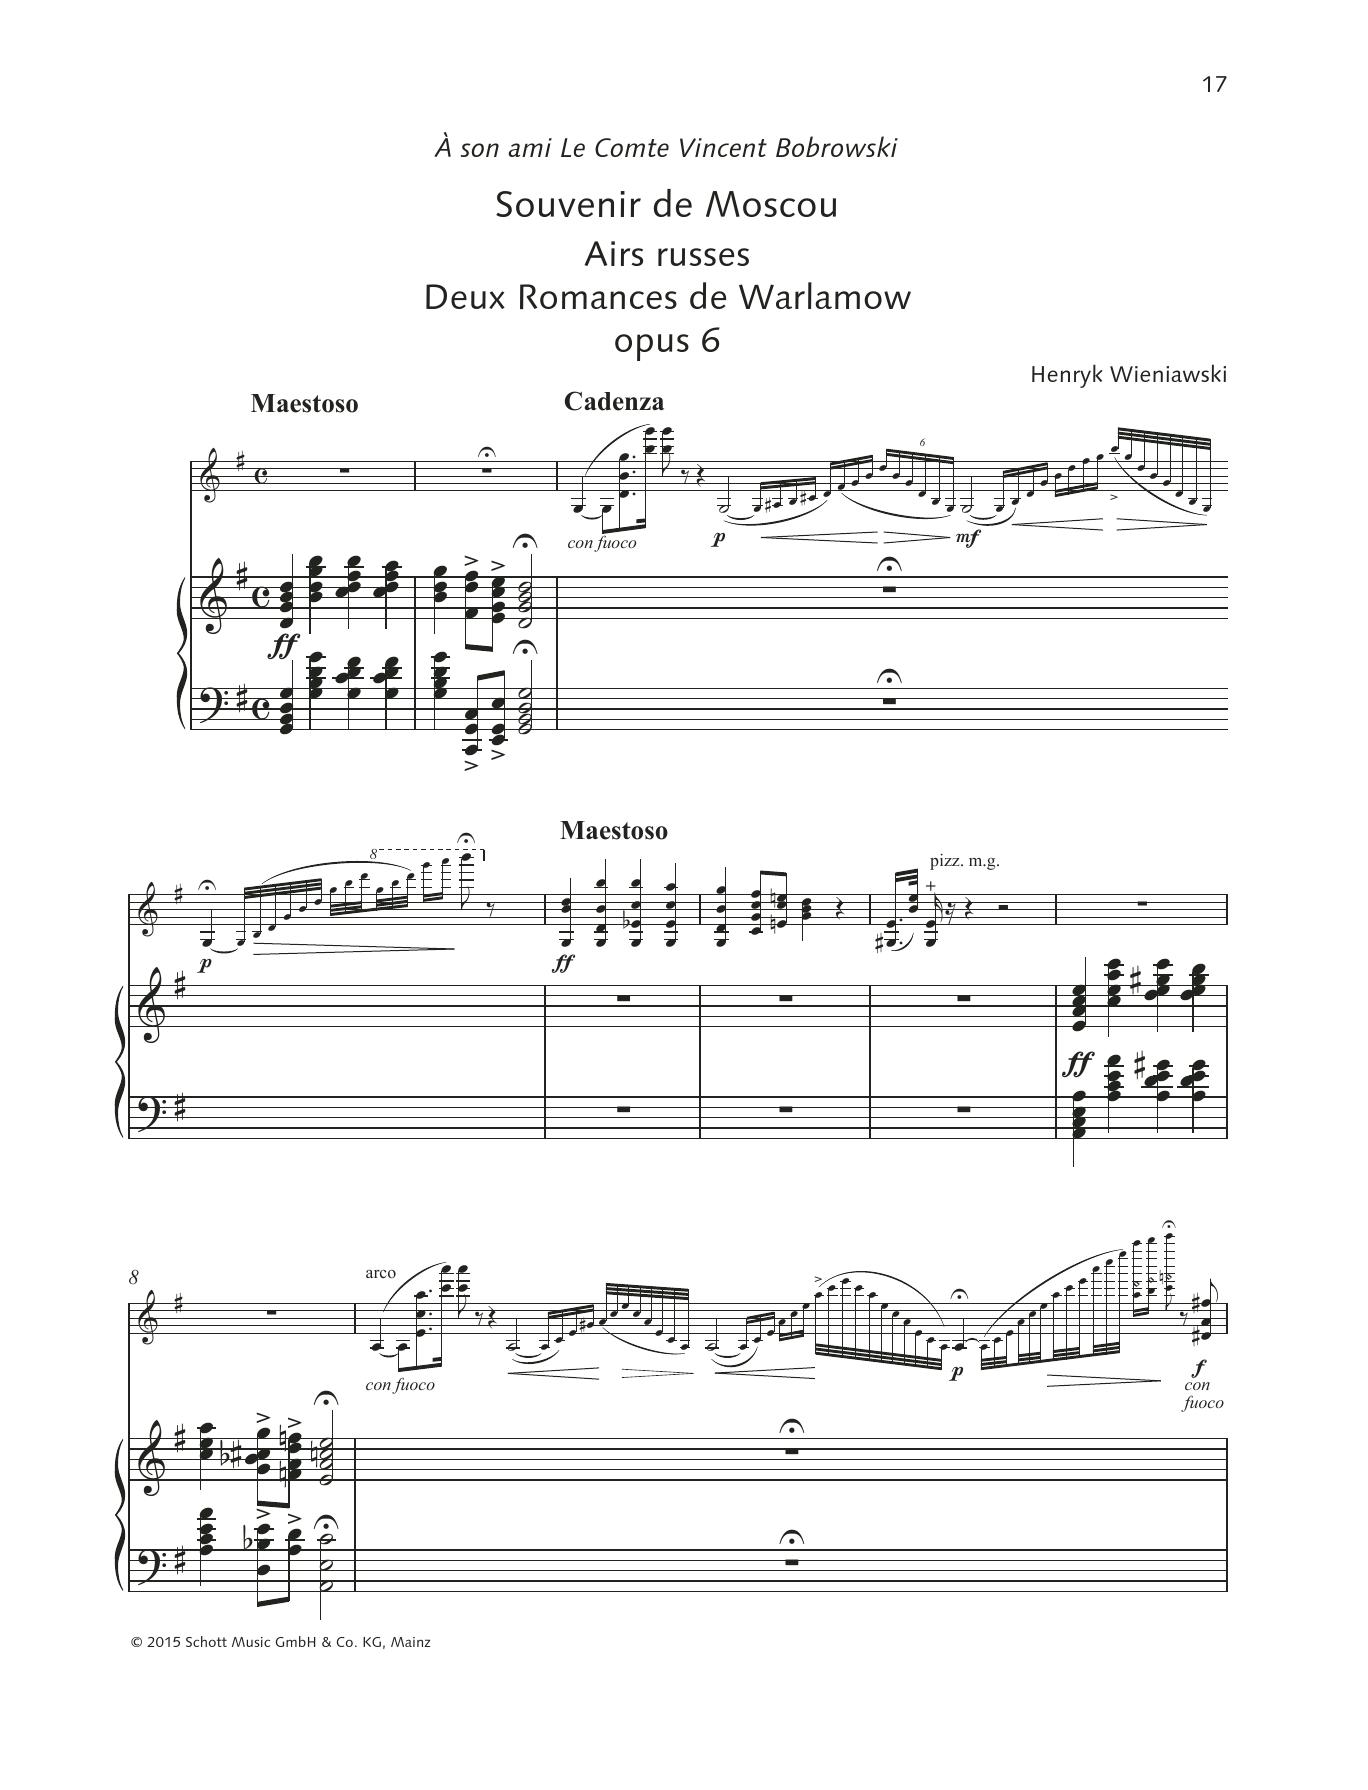 Souvenir de Moscou/Airs russes Sheet Music